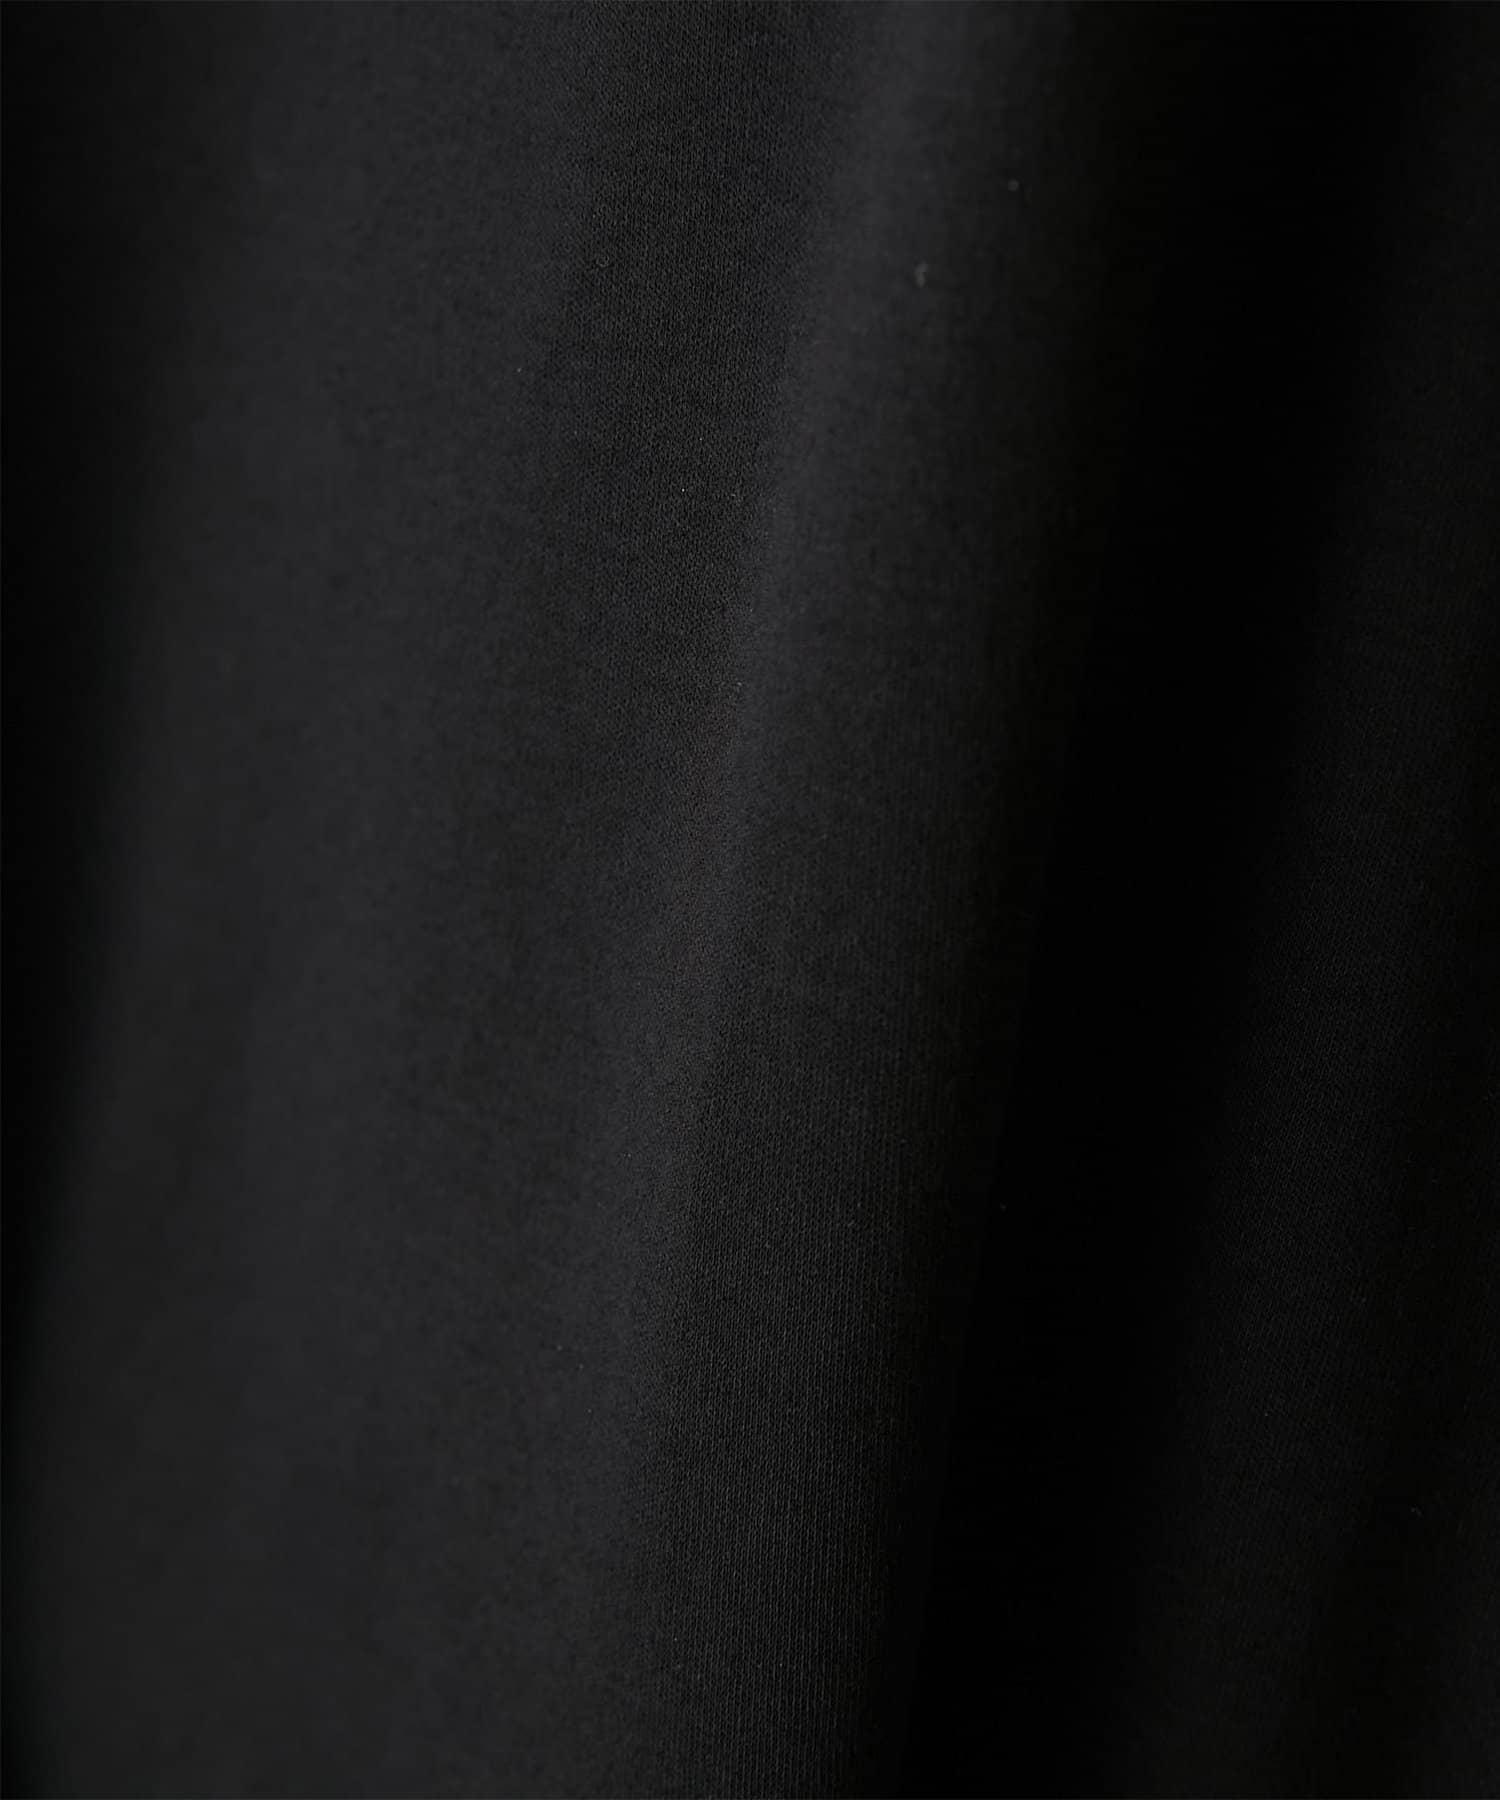 GALLARDAGALANTE(ガリャルダガランテ) 【CEPIE.】アシンメトリーチュニック